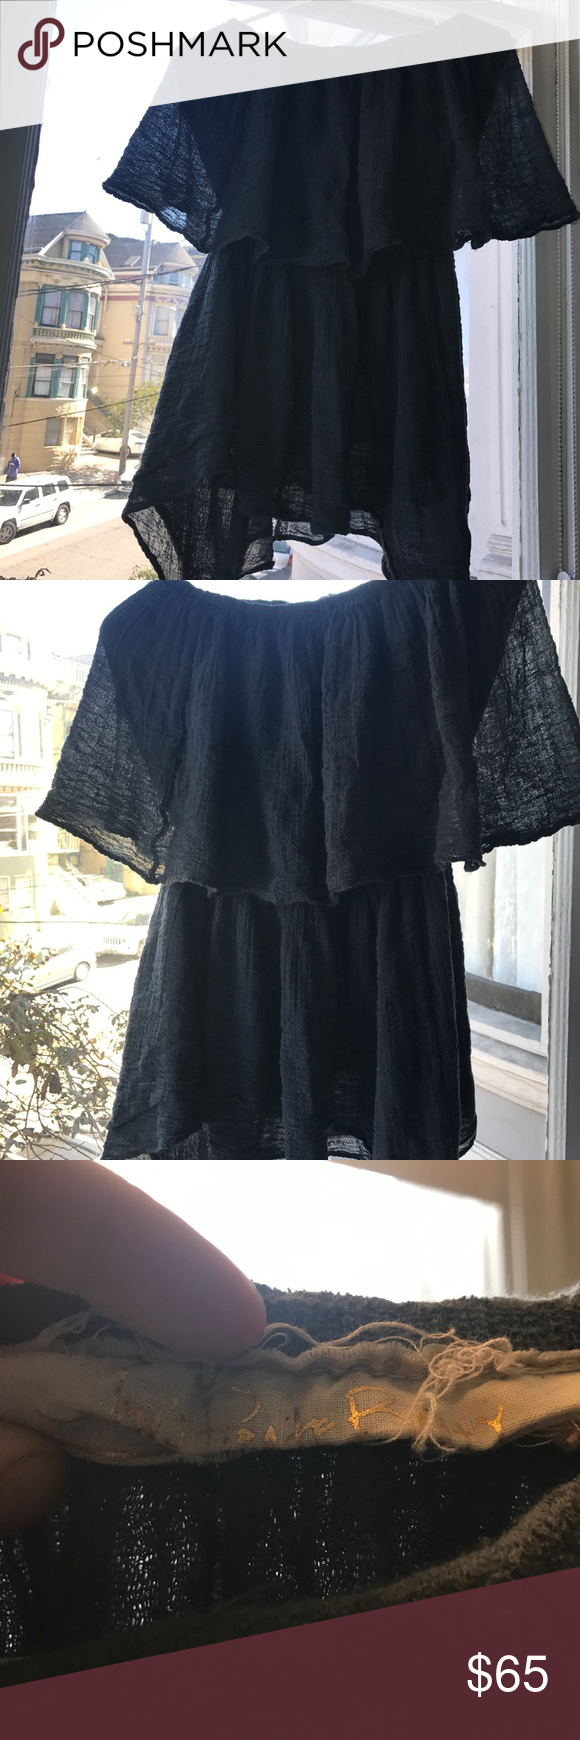 jens pírate booty tube dress   bandeau dress, gray color and blue grey